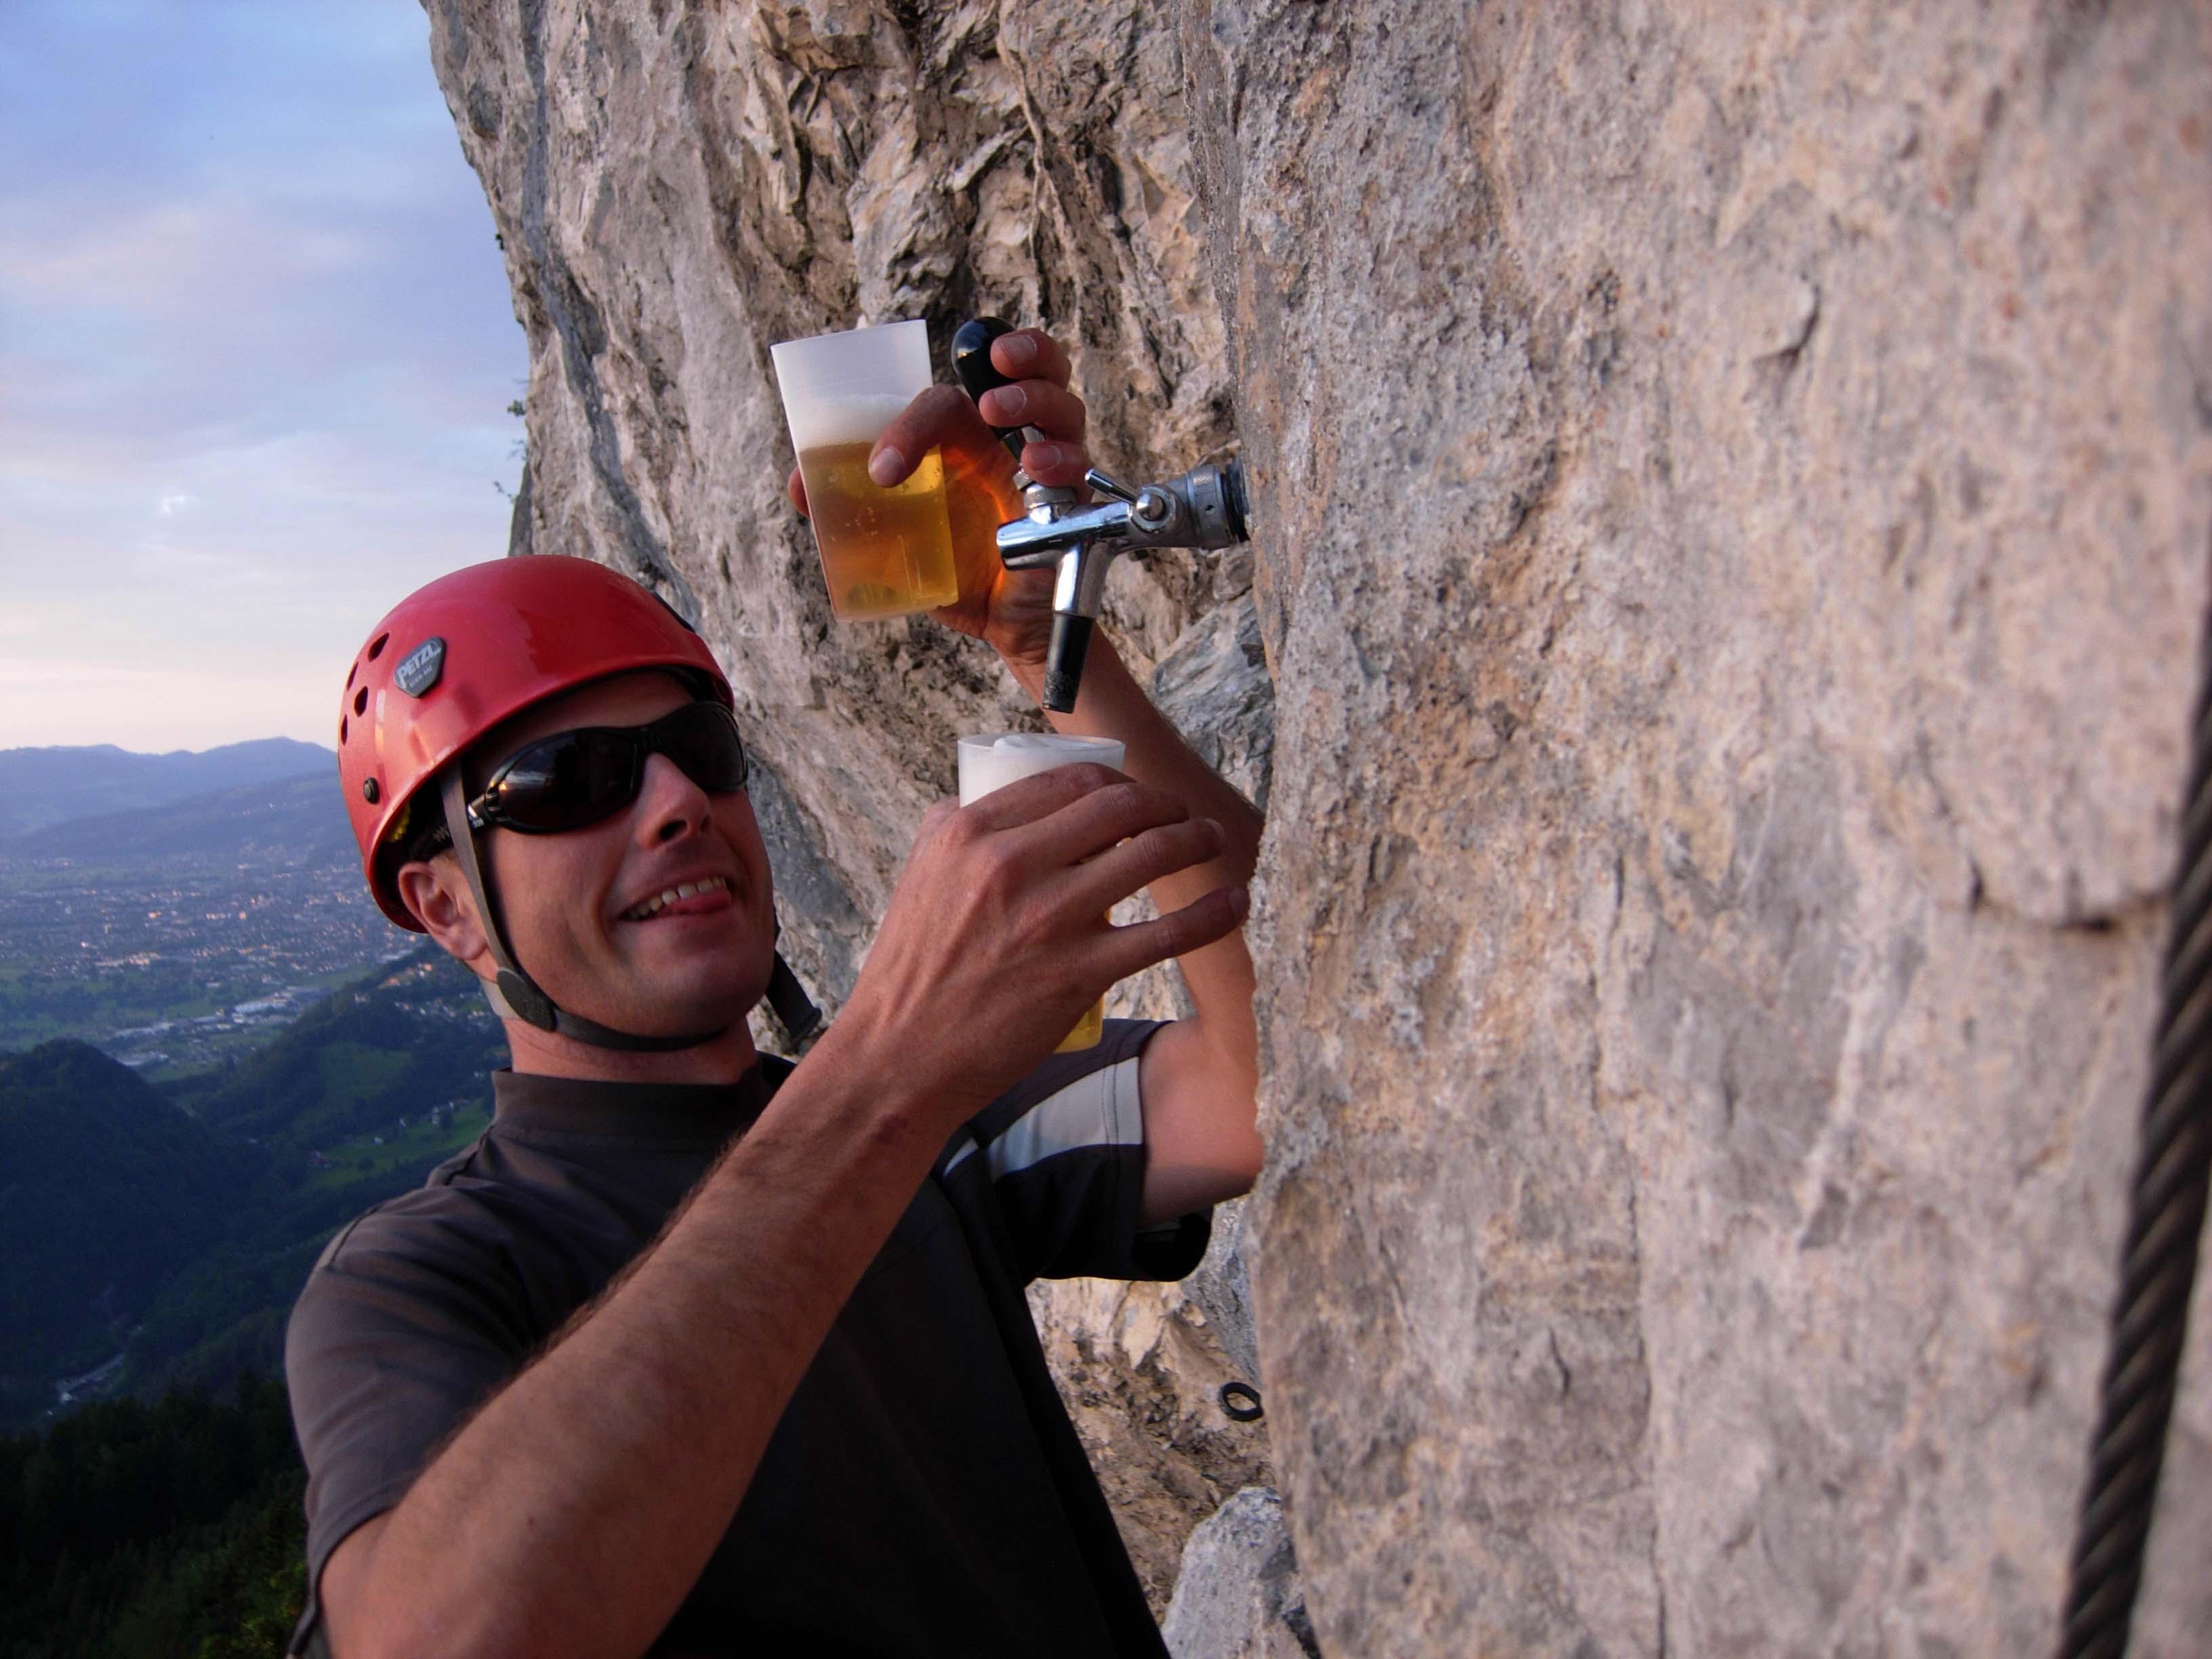 Klettersteig Via Kapf : Bernis bergzauber im internetz :: kapf 1153m über via unf